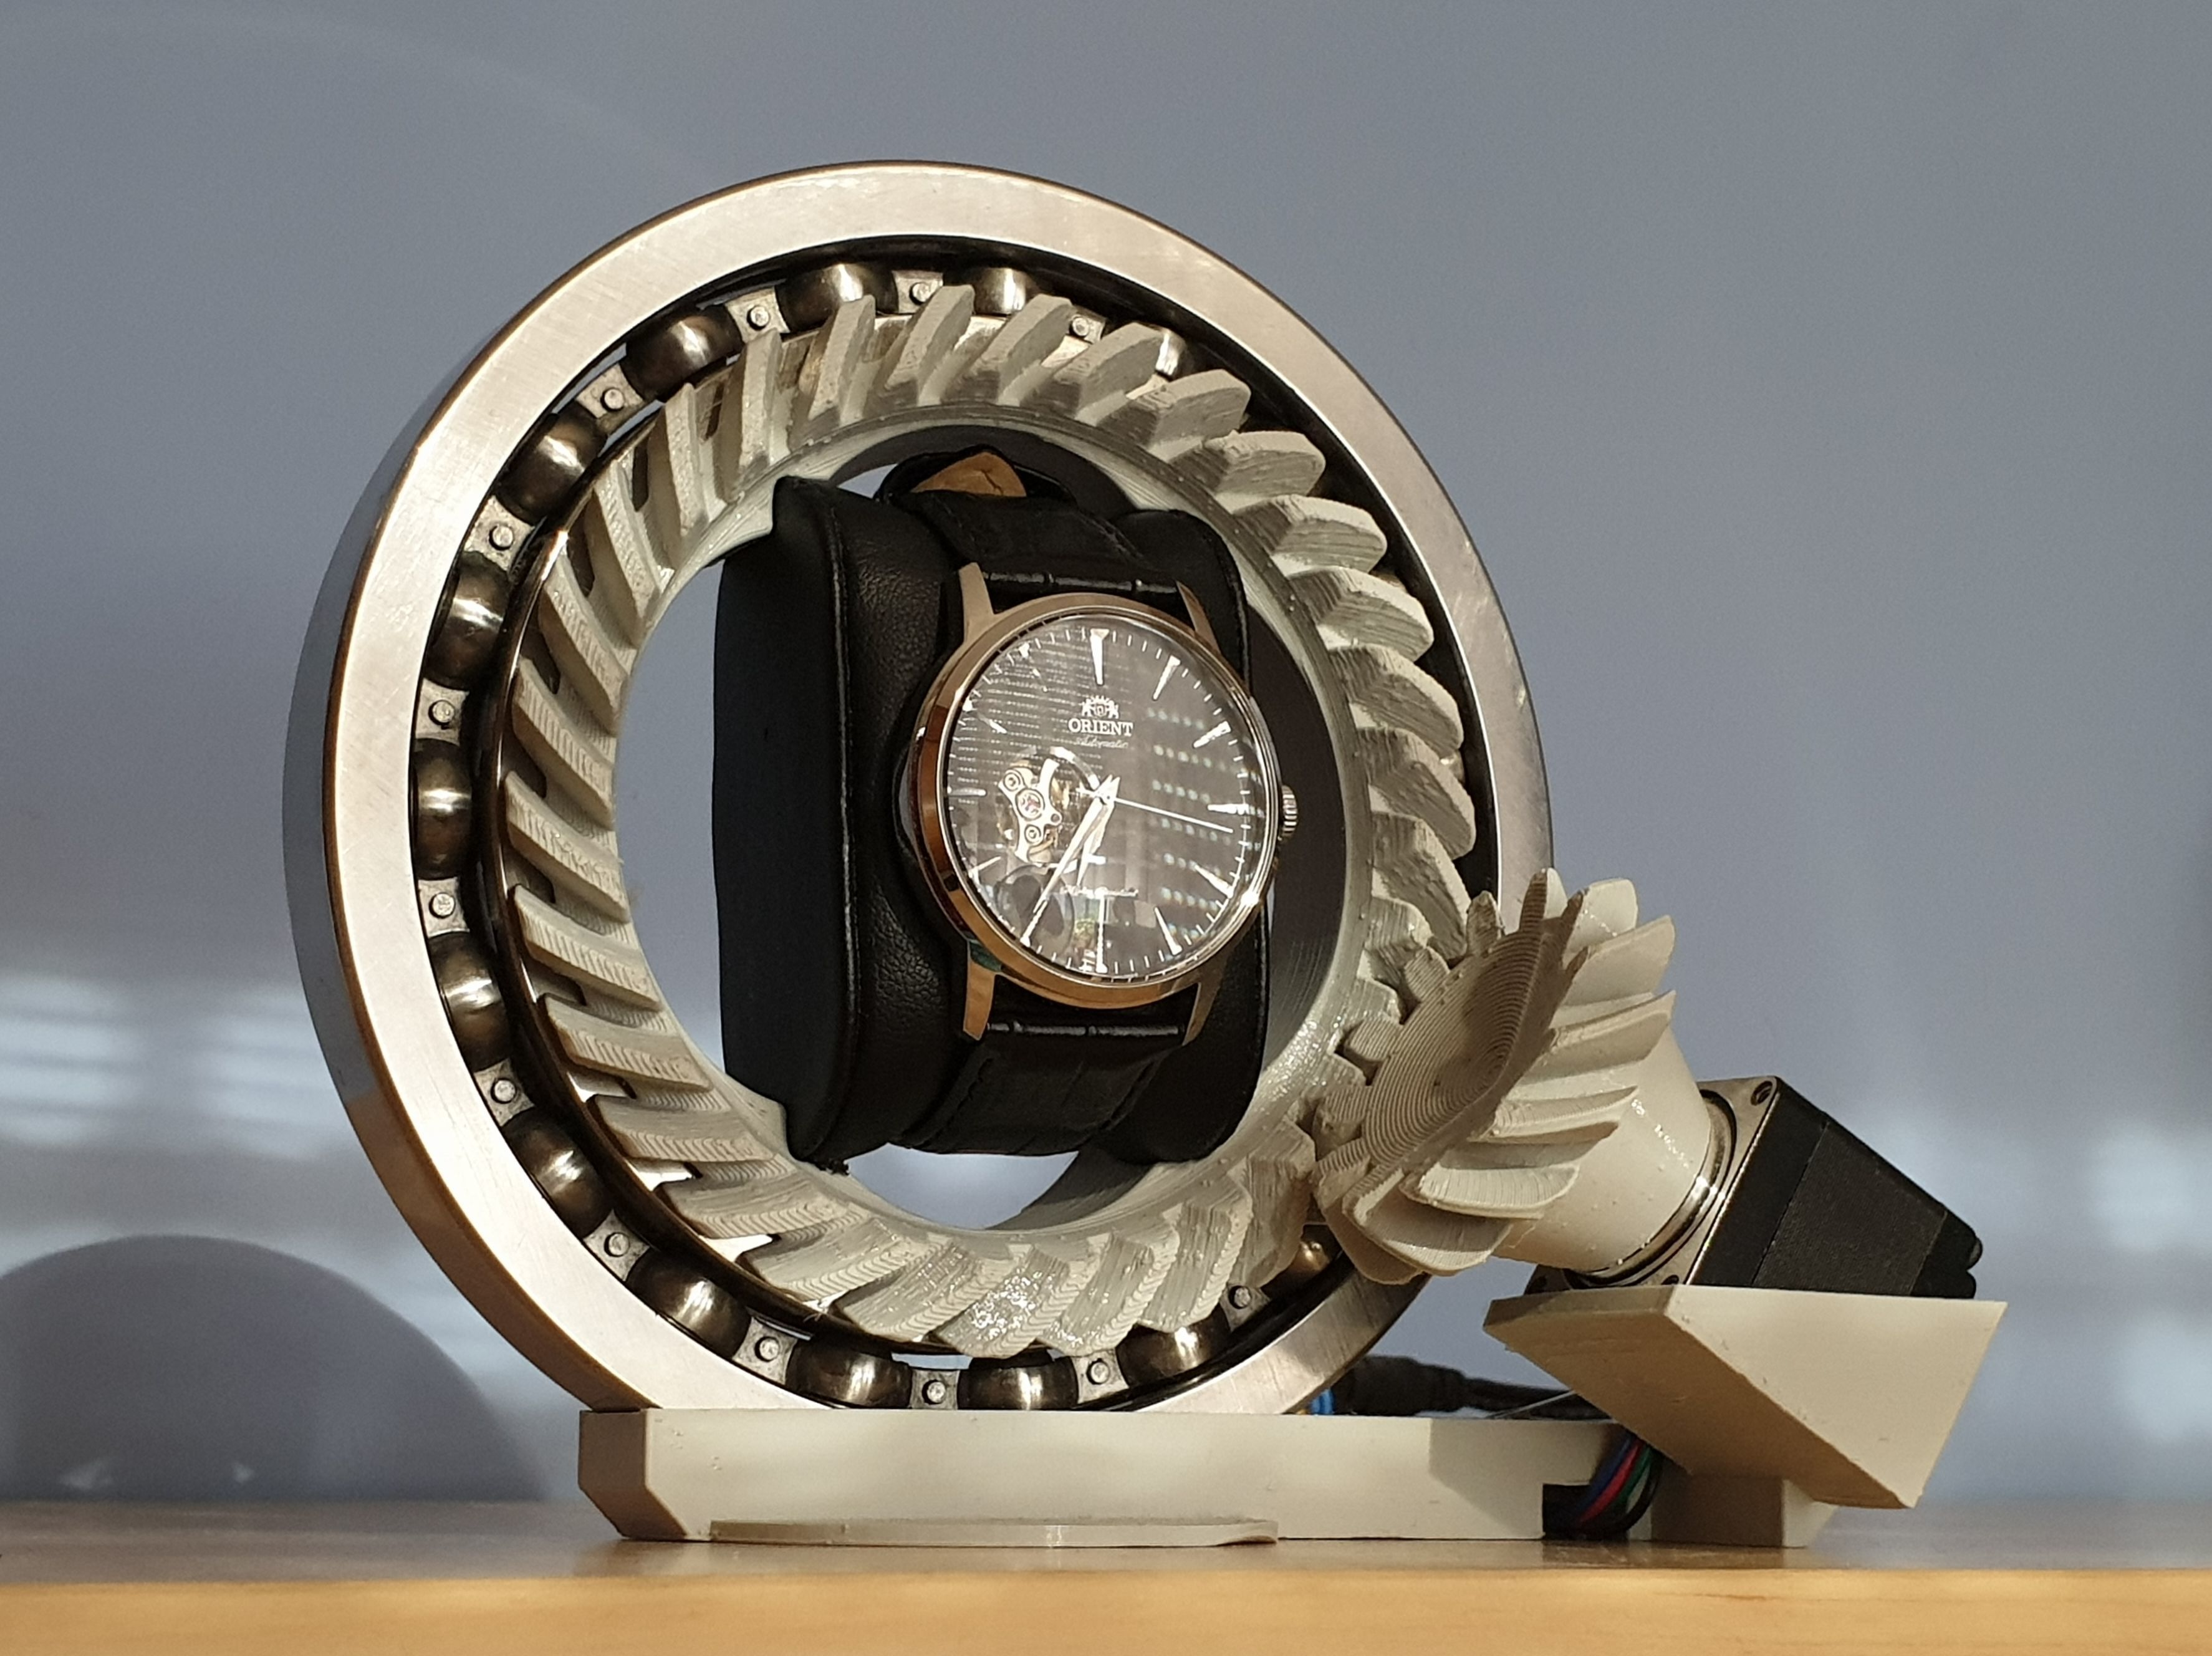 Watch winder by Damian Lickindorf - mechanics only